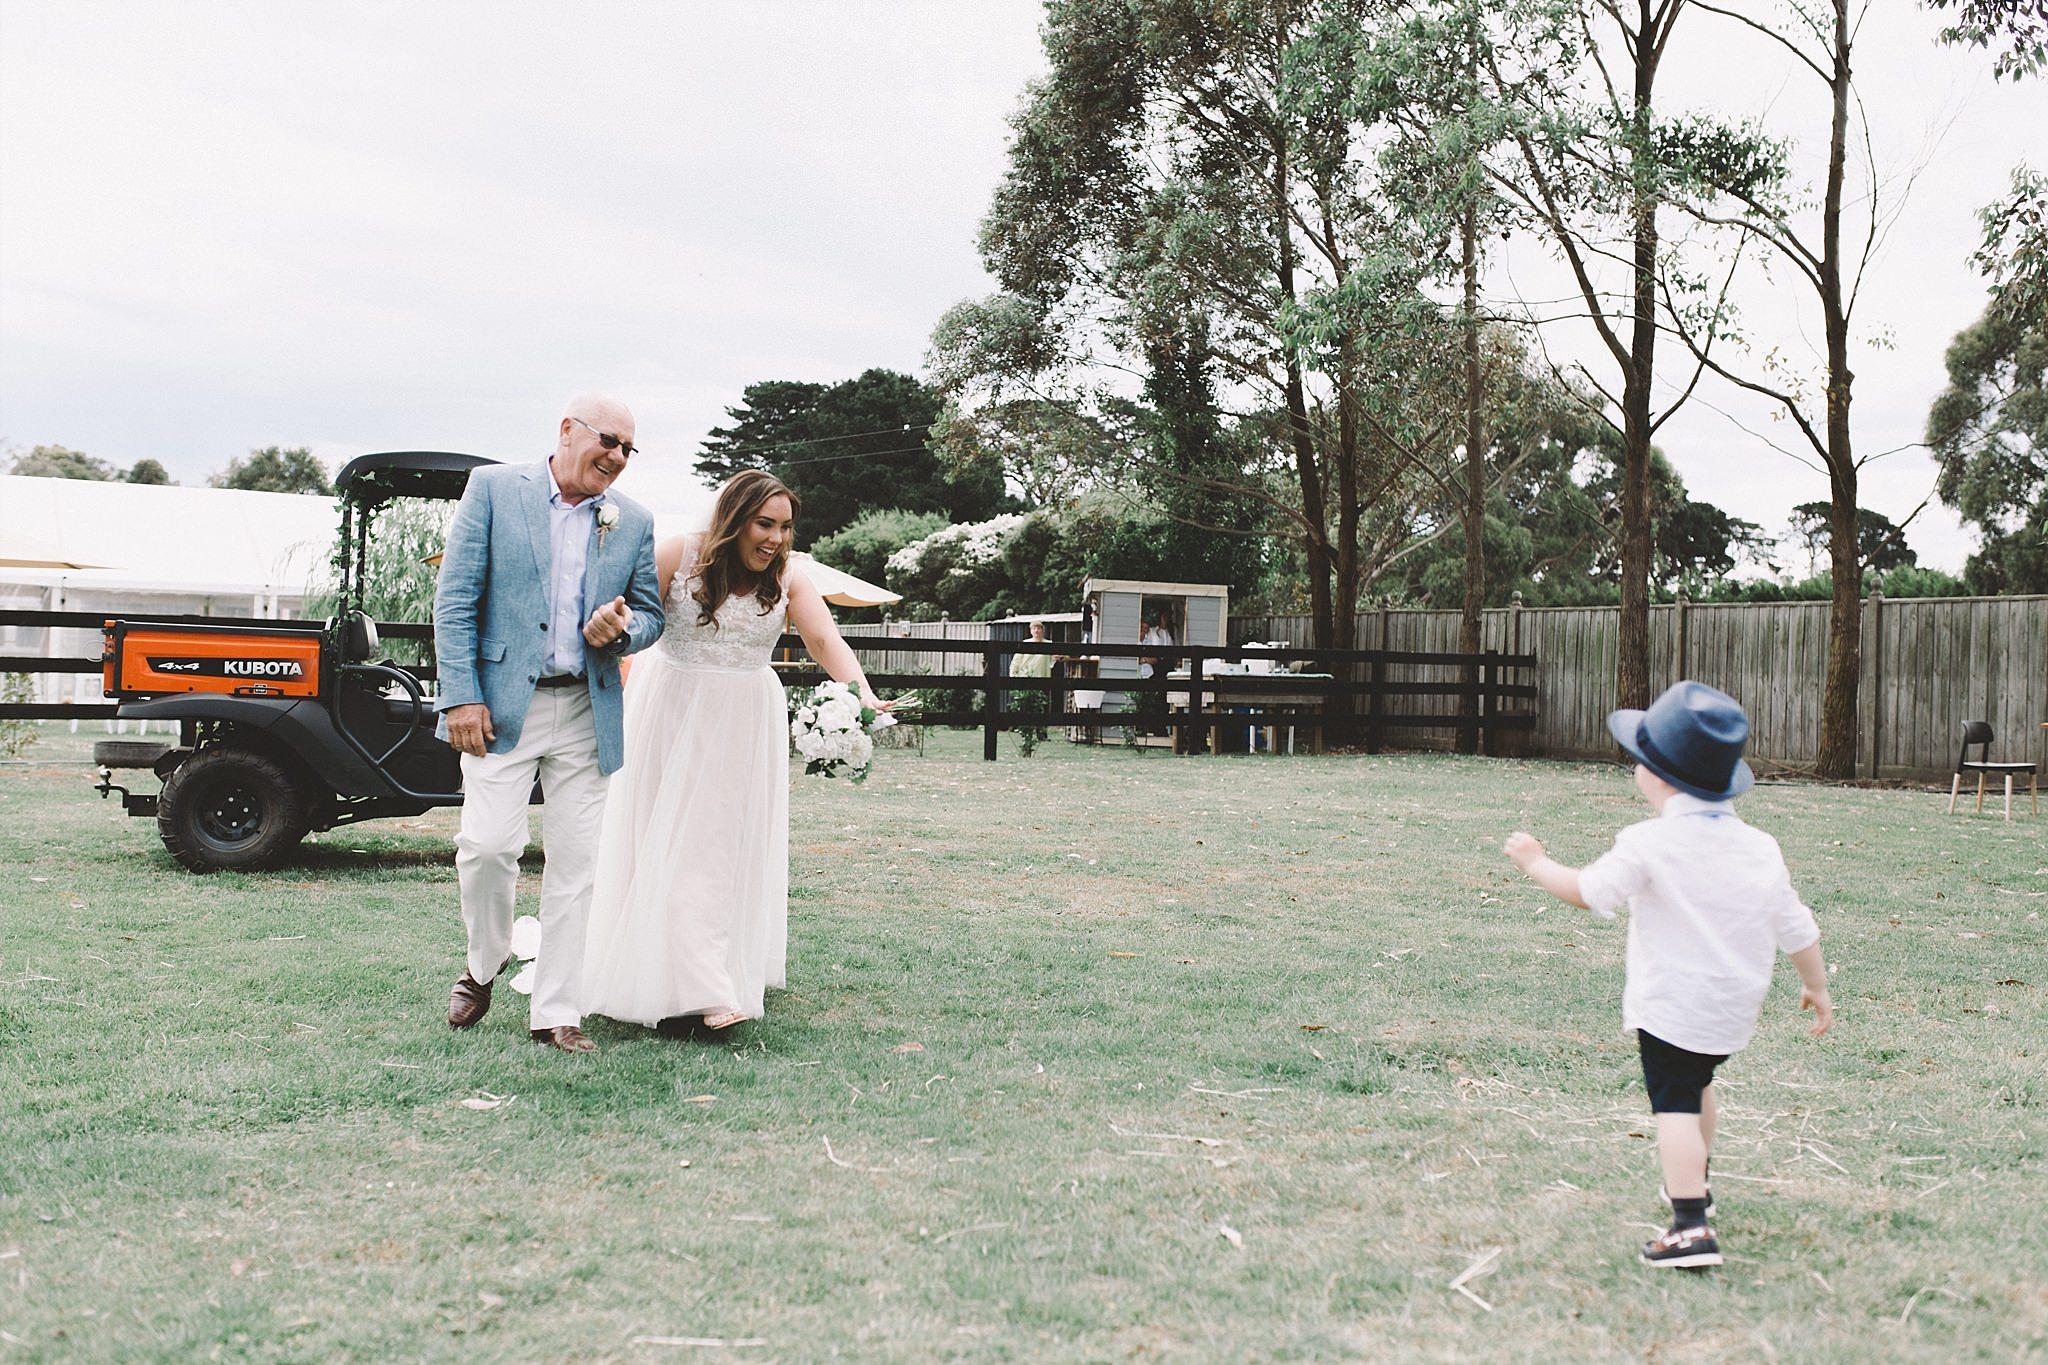 Mornington Peninsula Wedding Photographer 85.JPG